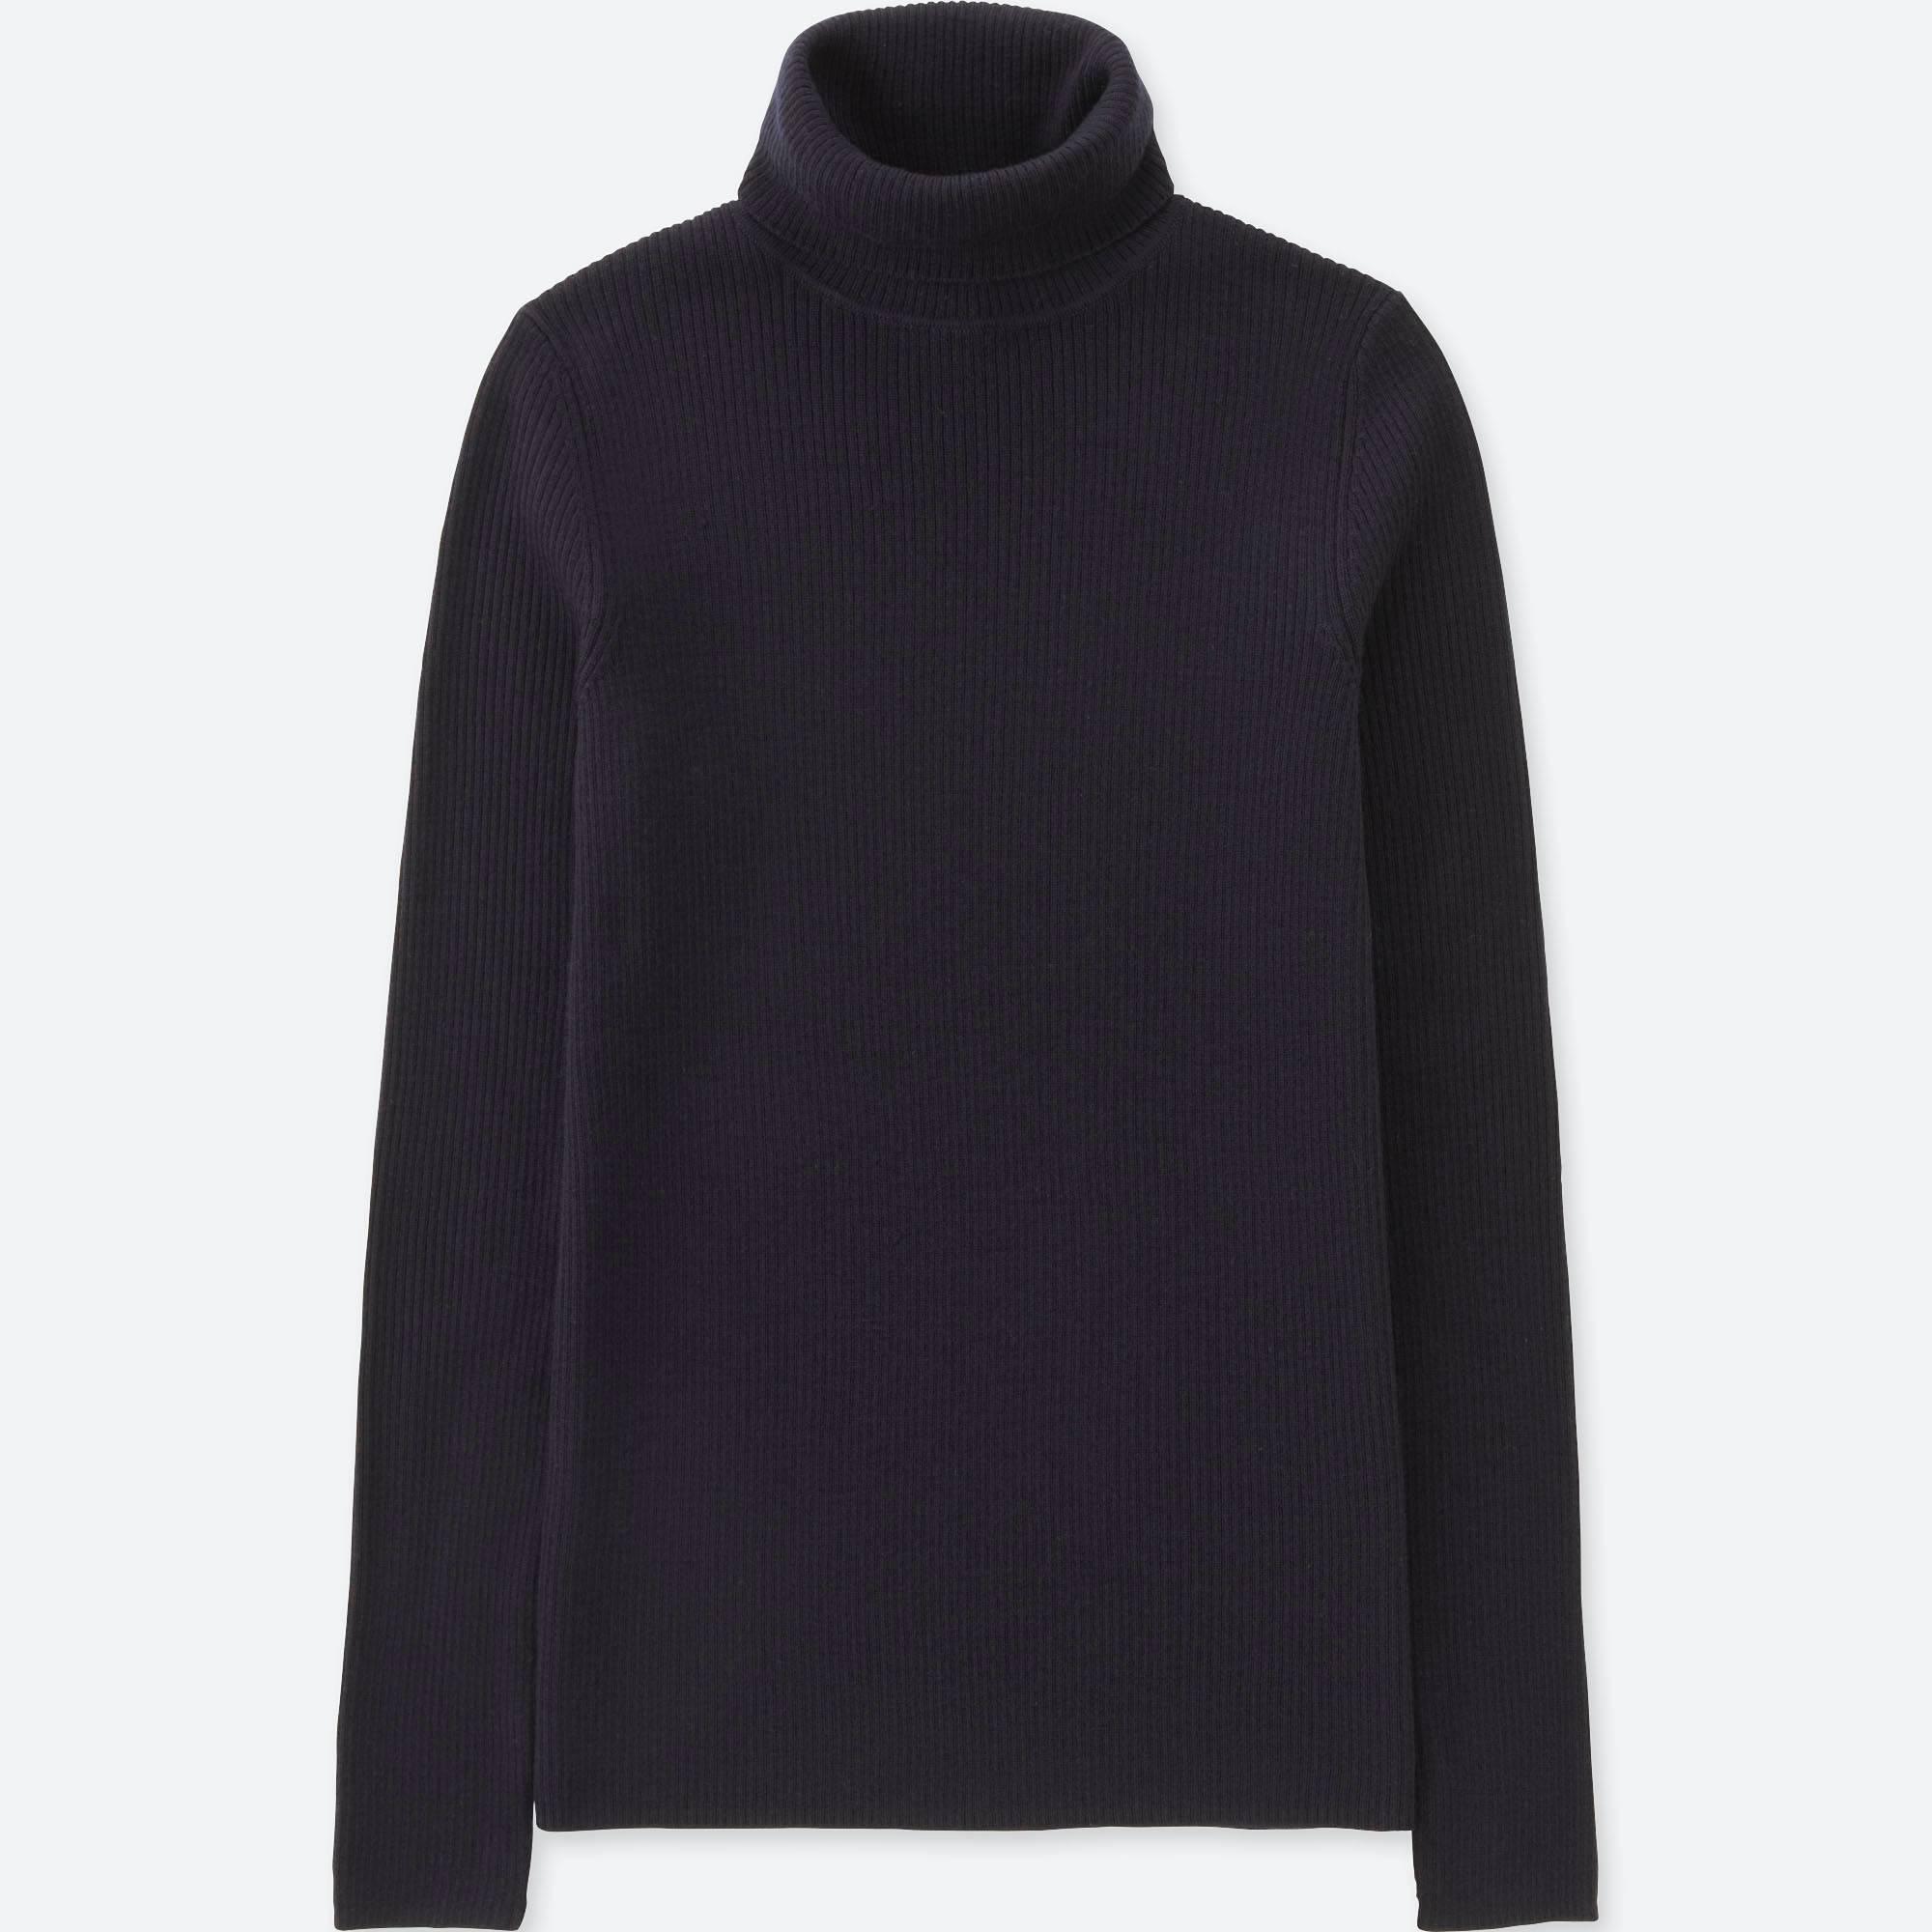 7e688e5f9b55 women extra fine merino ribbed turtleneck sweater